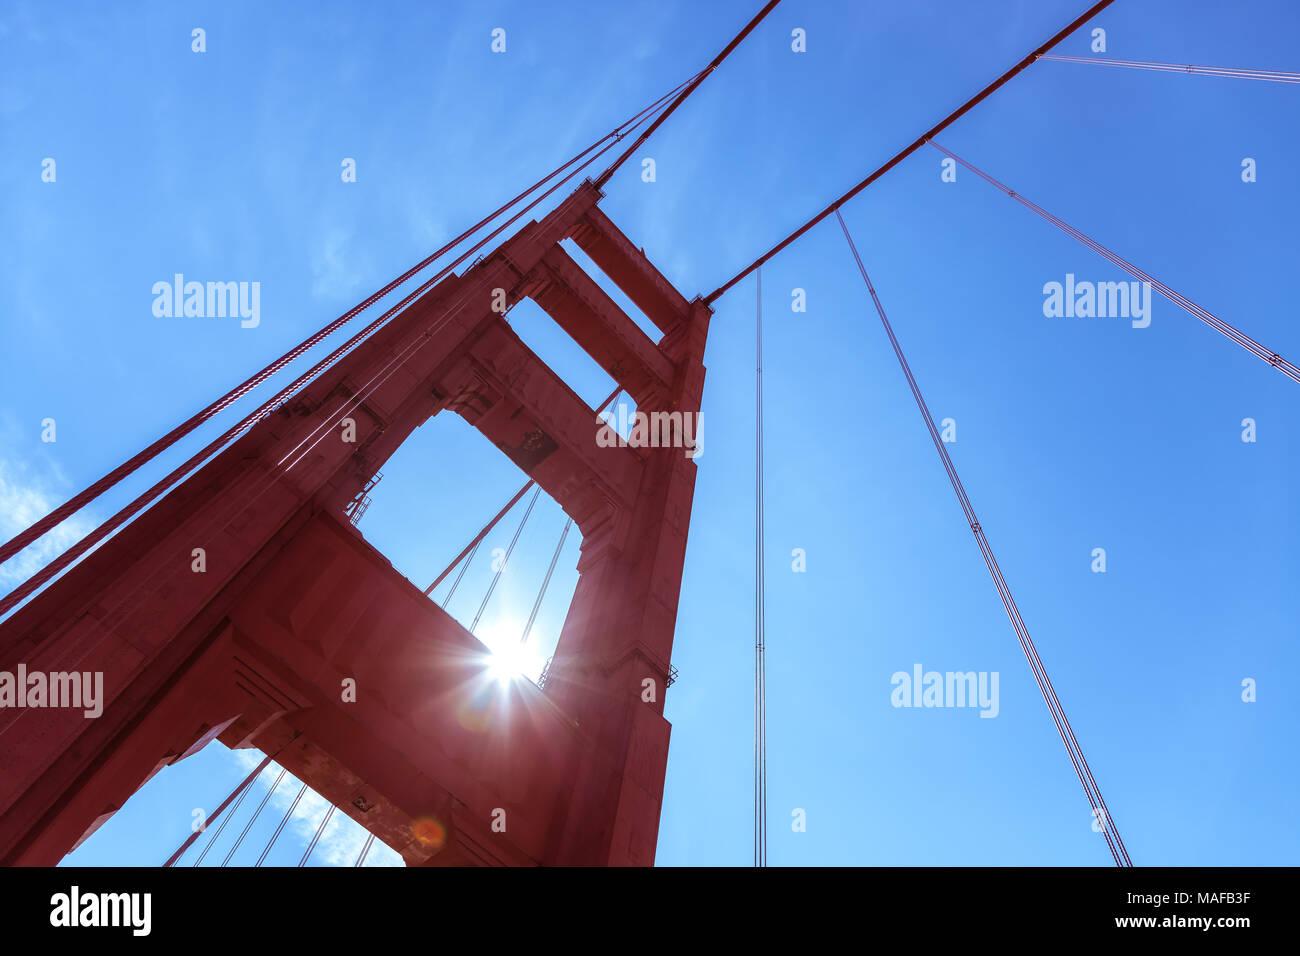 Struktur der Golden Gate Bridge Tower, San Francisco, Kalifornien, USA. Stockbild